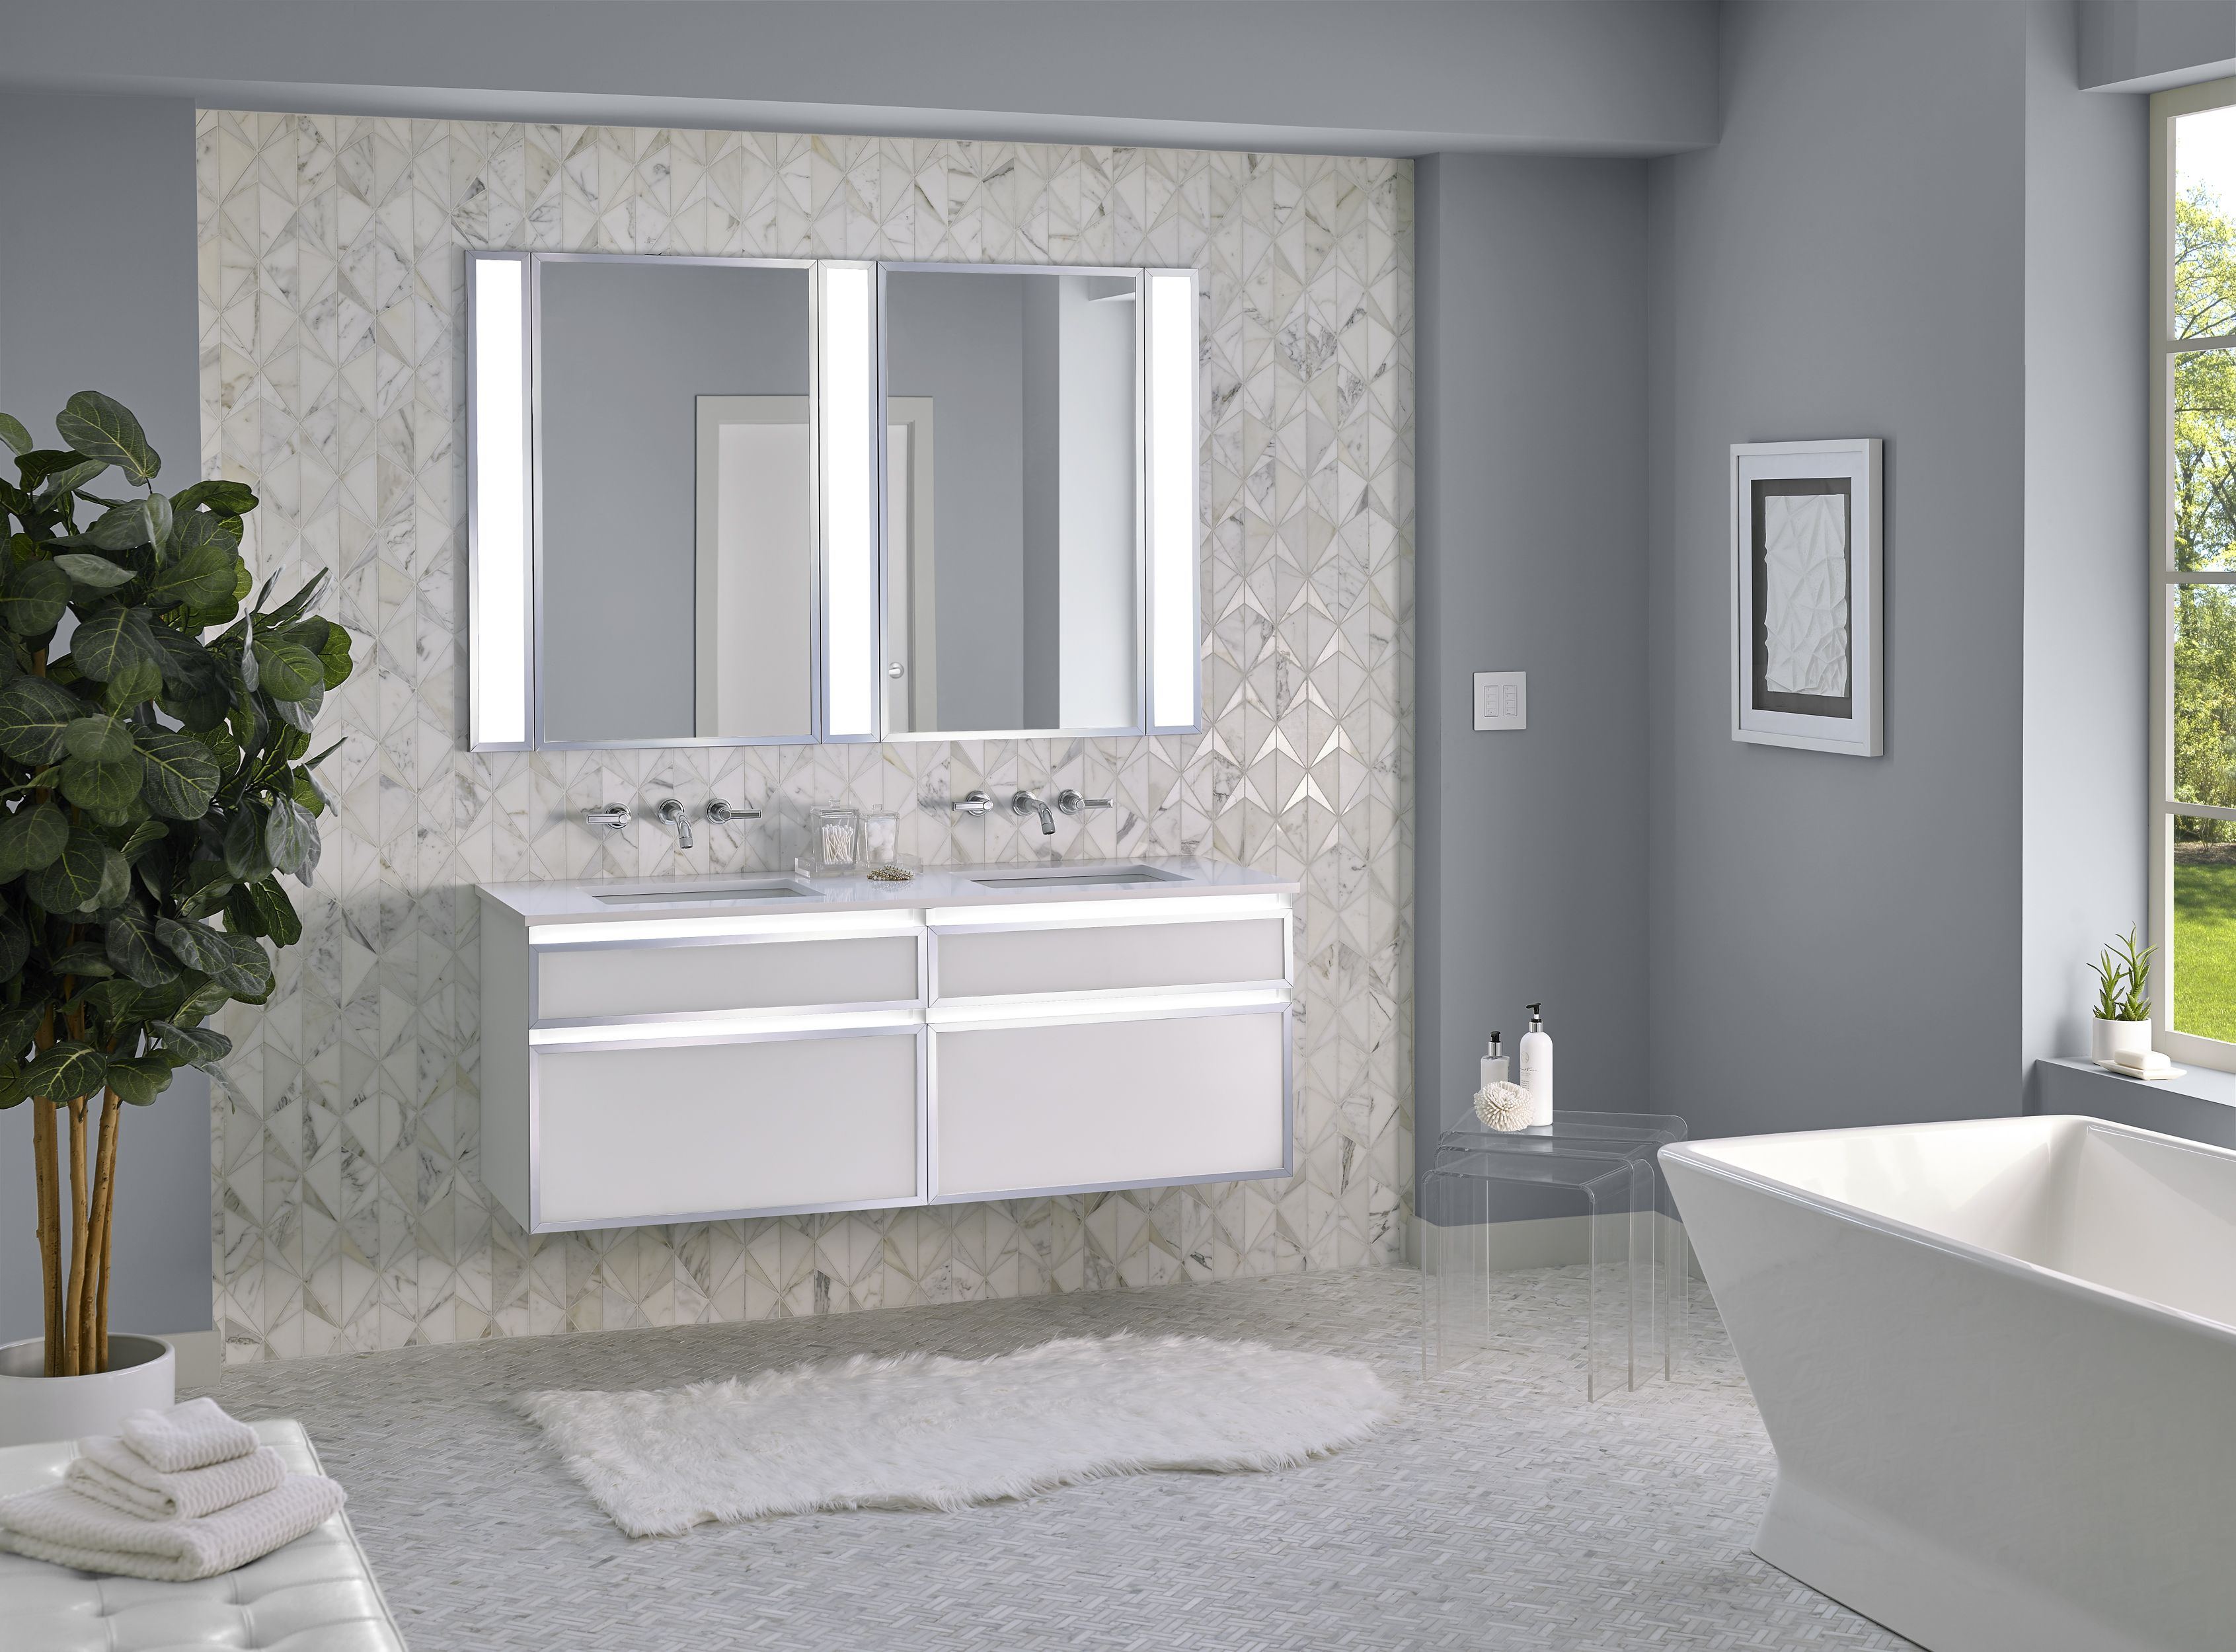 Profiles Lighting Bathroom Lighting Tips Bathroom with regard to size 3383 X 2500